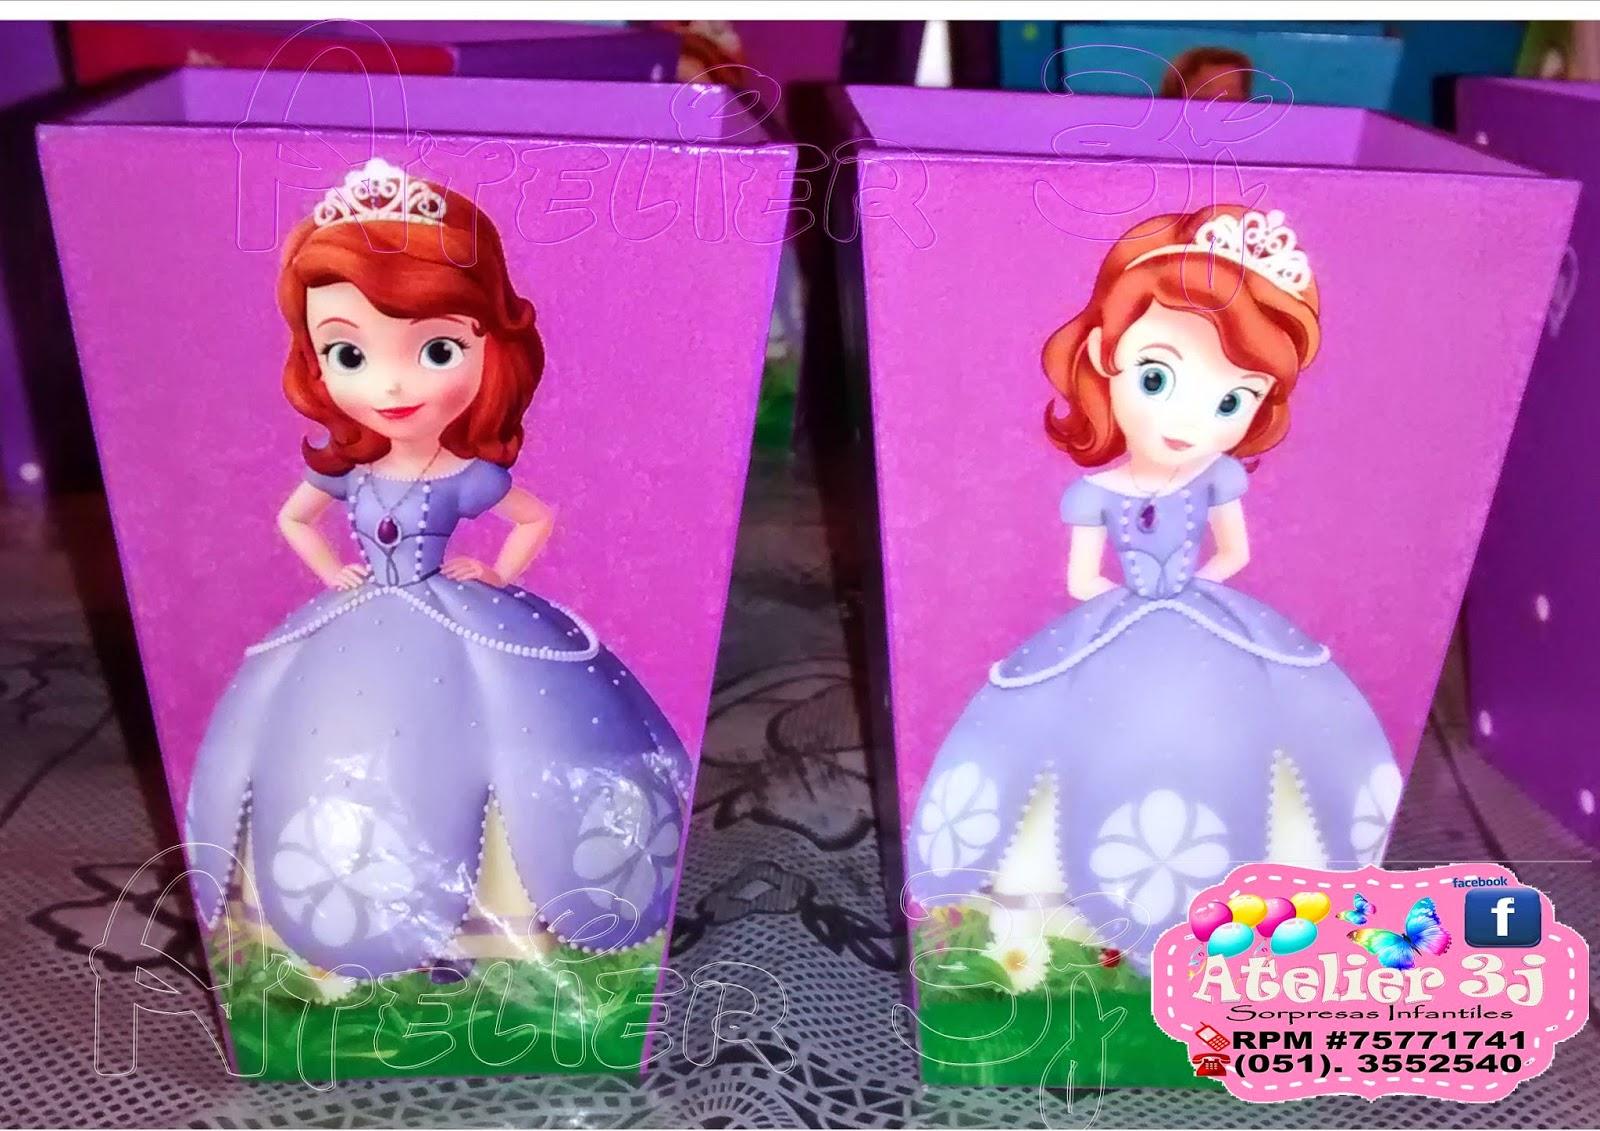 Atelier 3j sorpresas infantiles sorpresas infantiles de - Fiestas sorpresas de cumpleanos originales ...